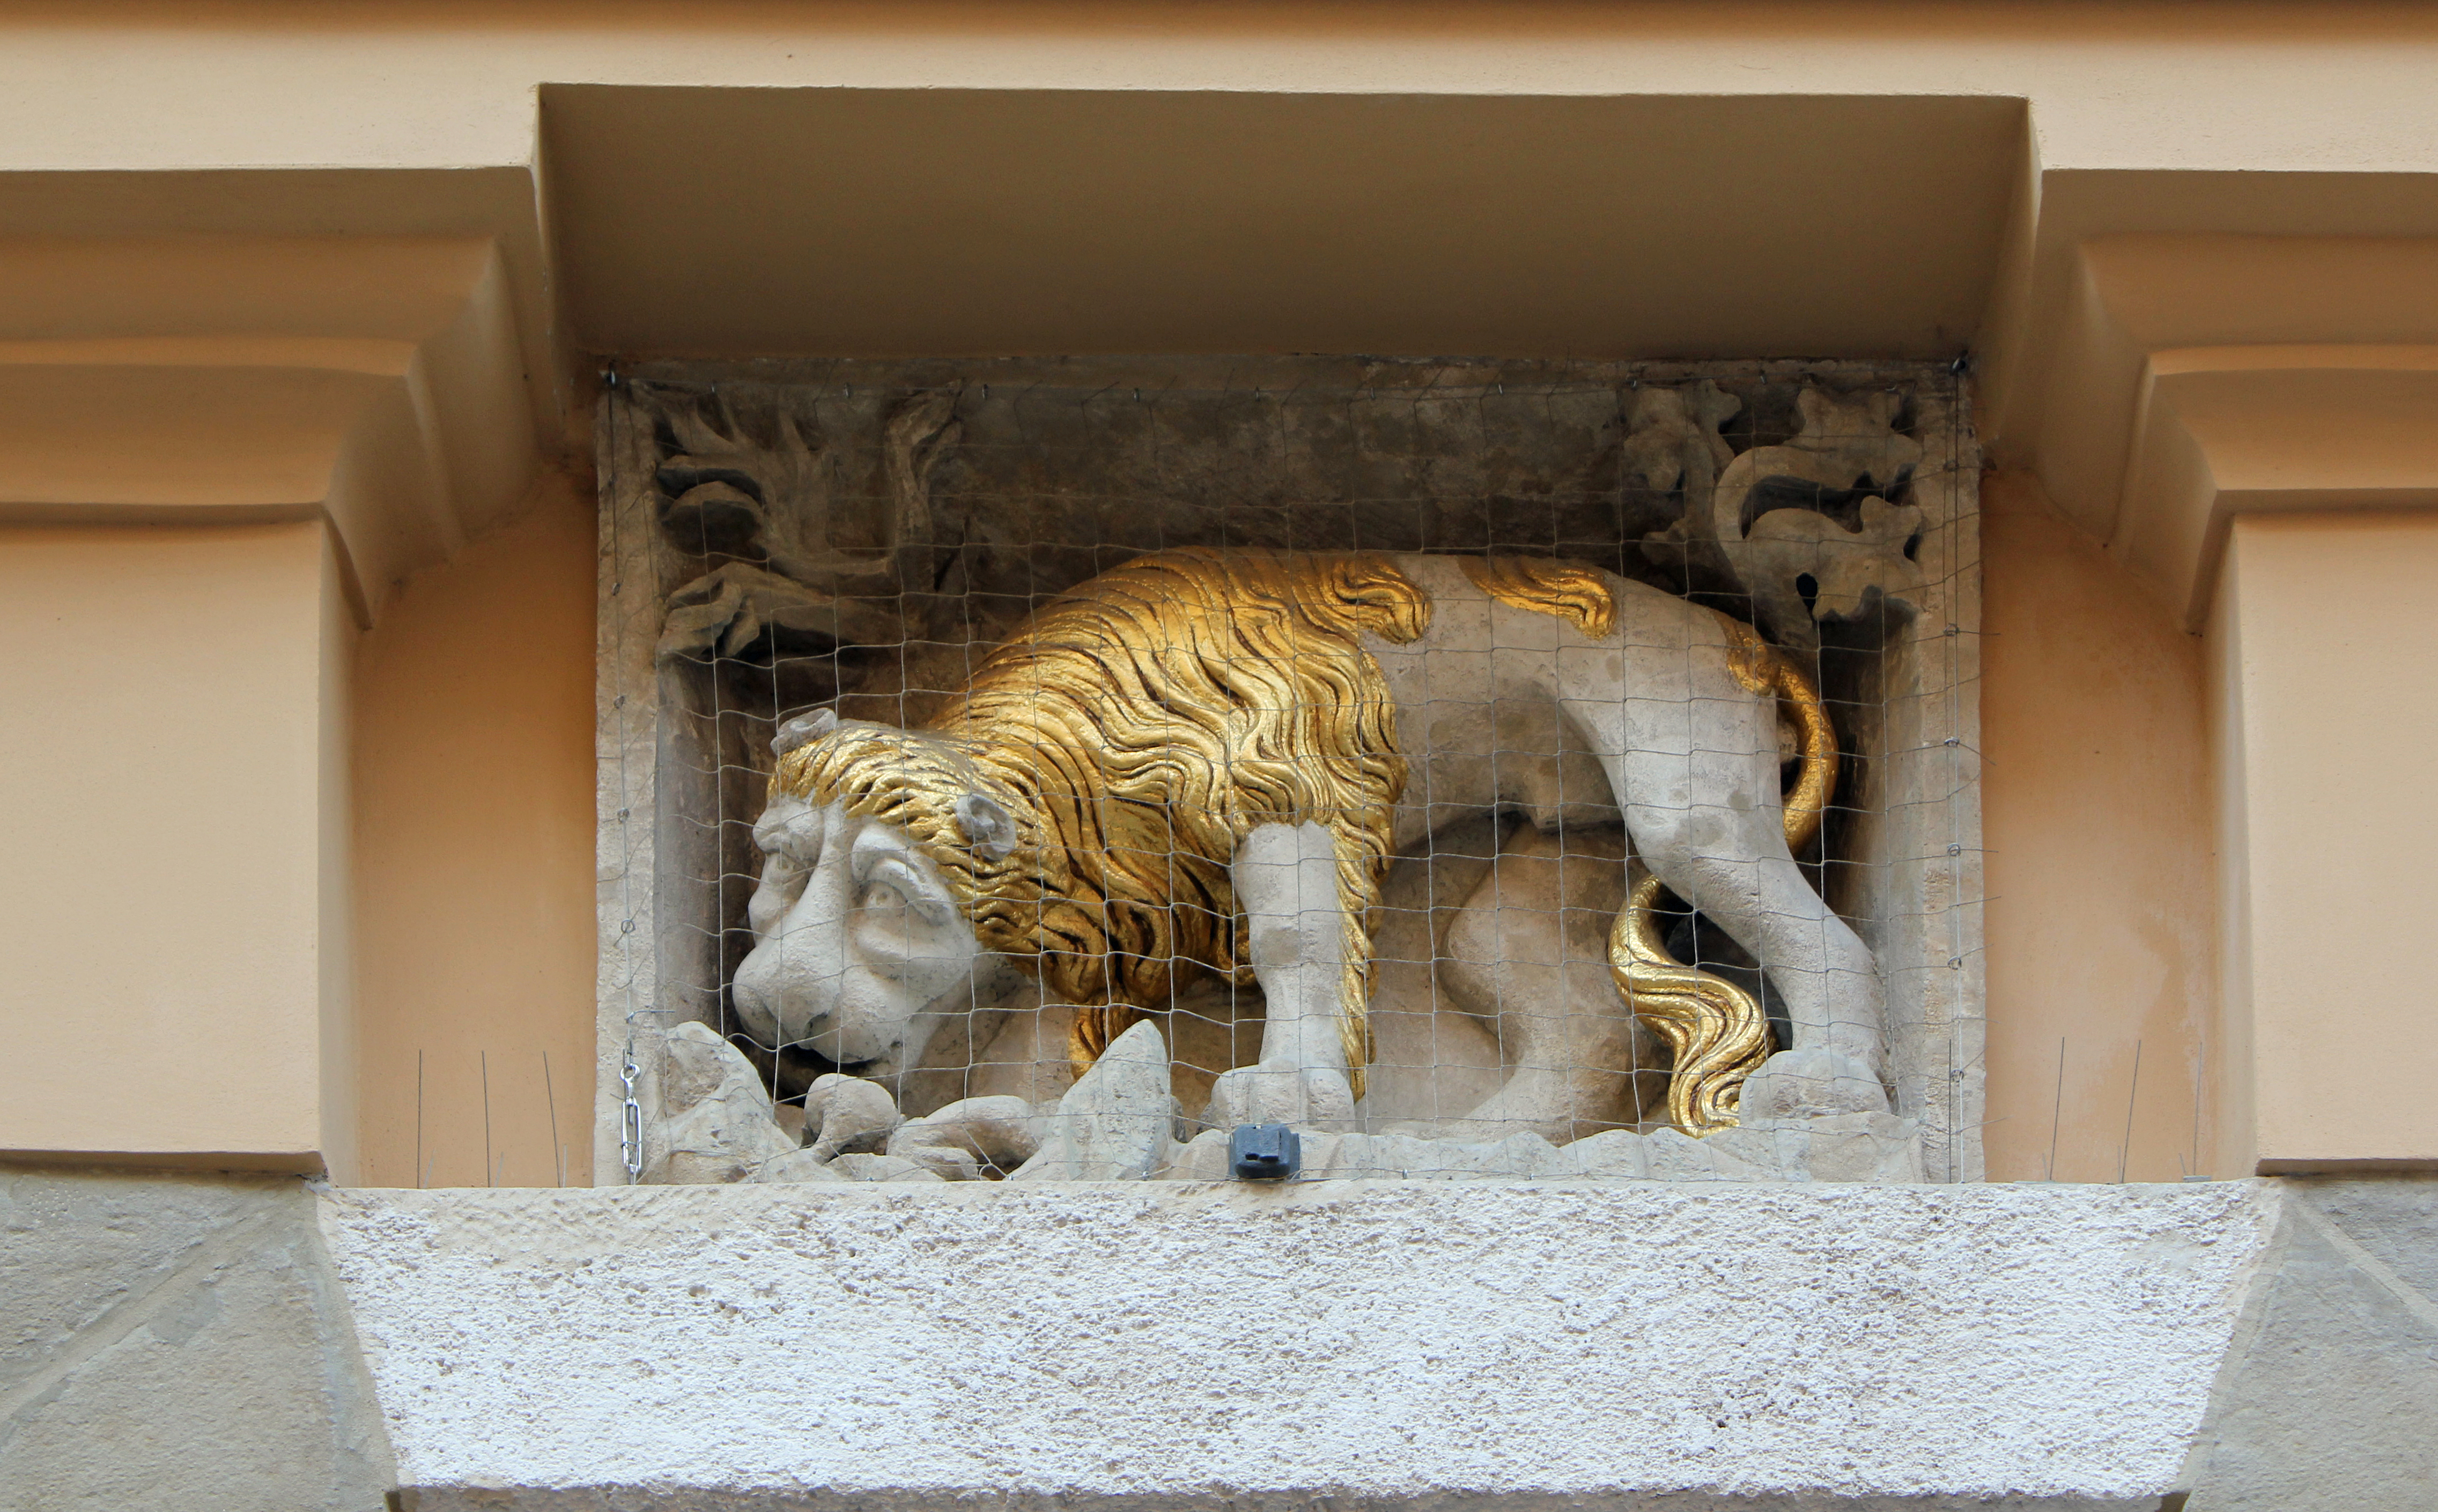 File:Podelwie (Under Lion) House, emblem, 32 Grodzka street, Old Town, Krakow, Poland.jpg - Wikimedia Commons